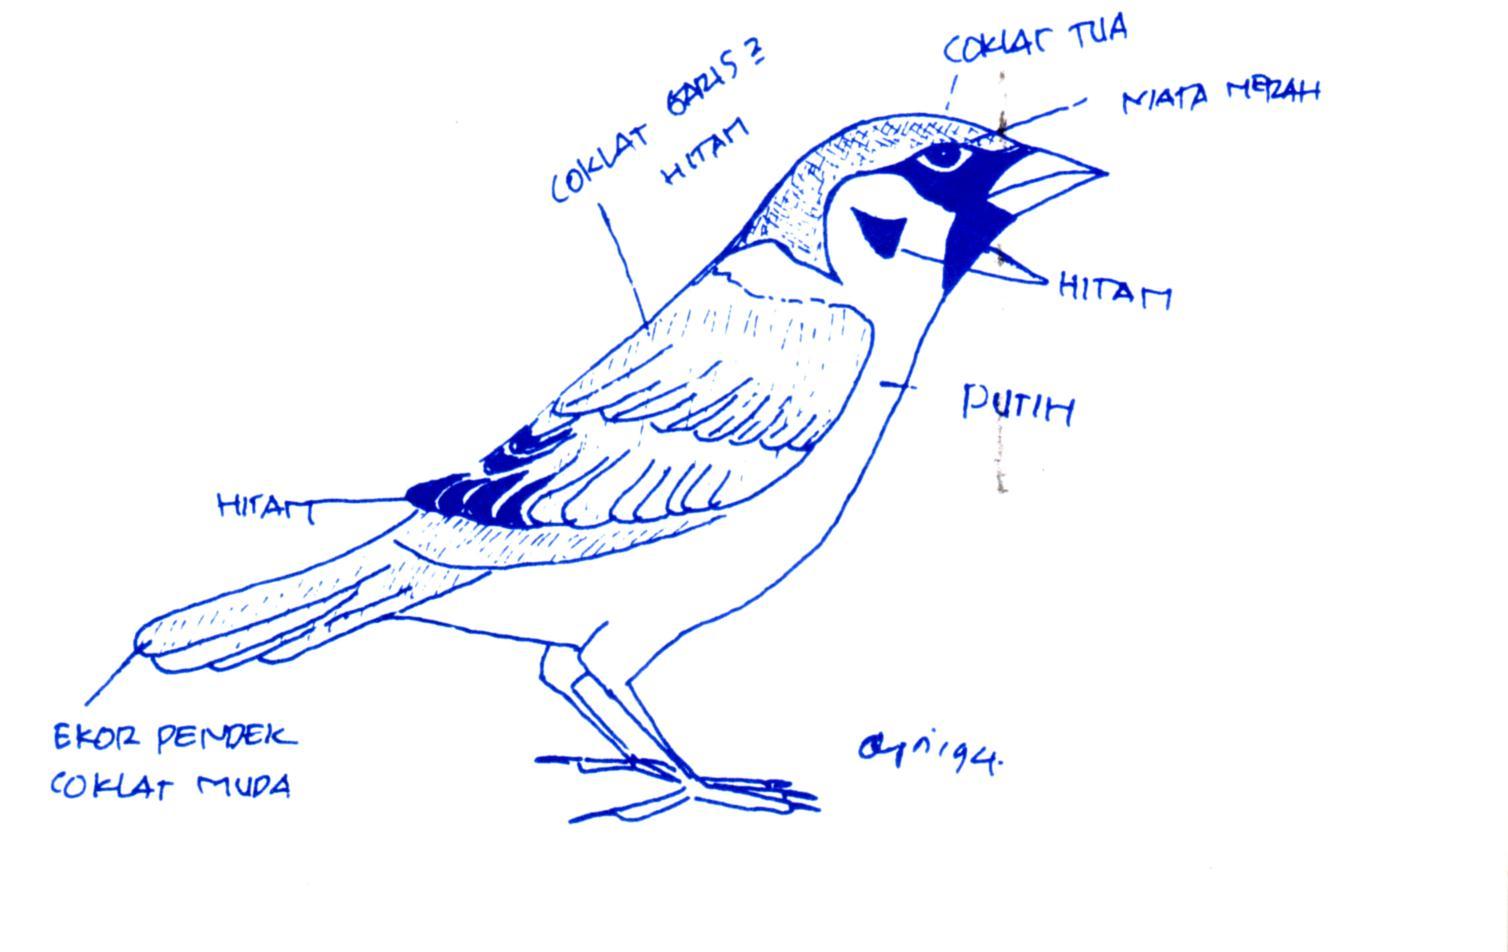 Kumpulan Sketsa Gambar Burung Gereja